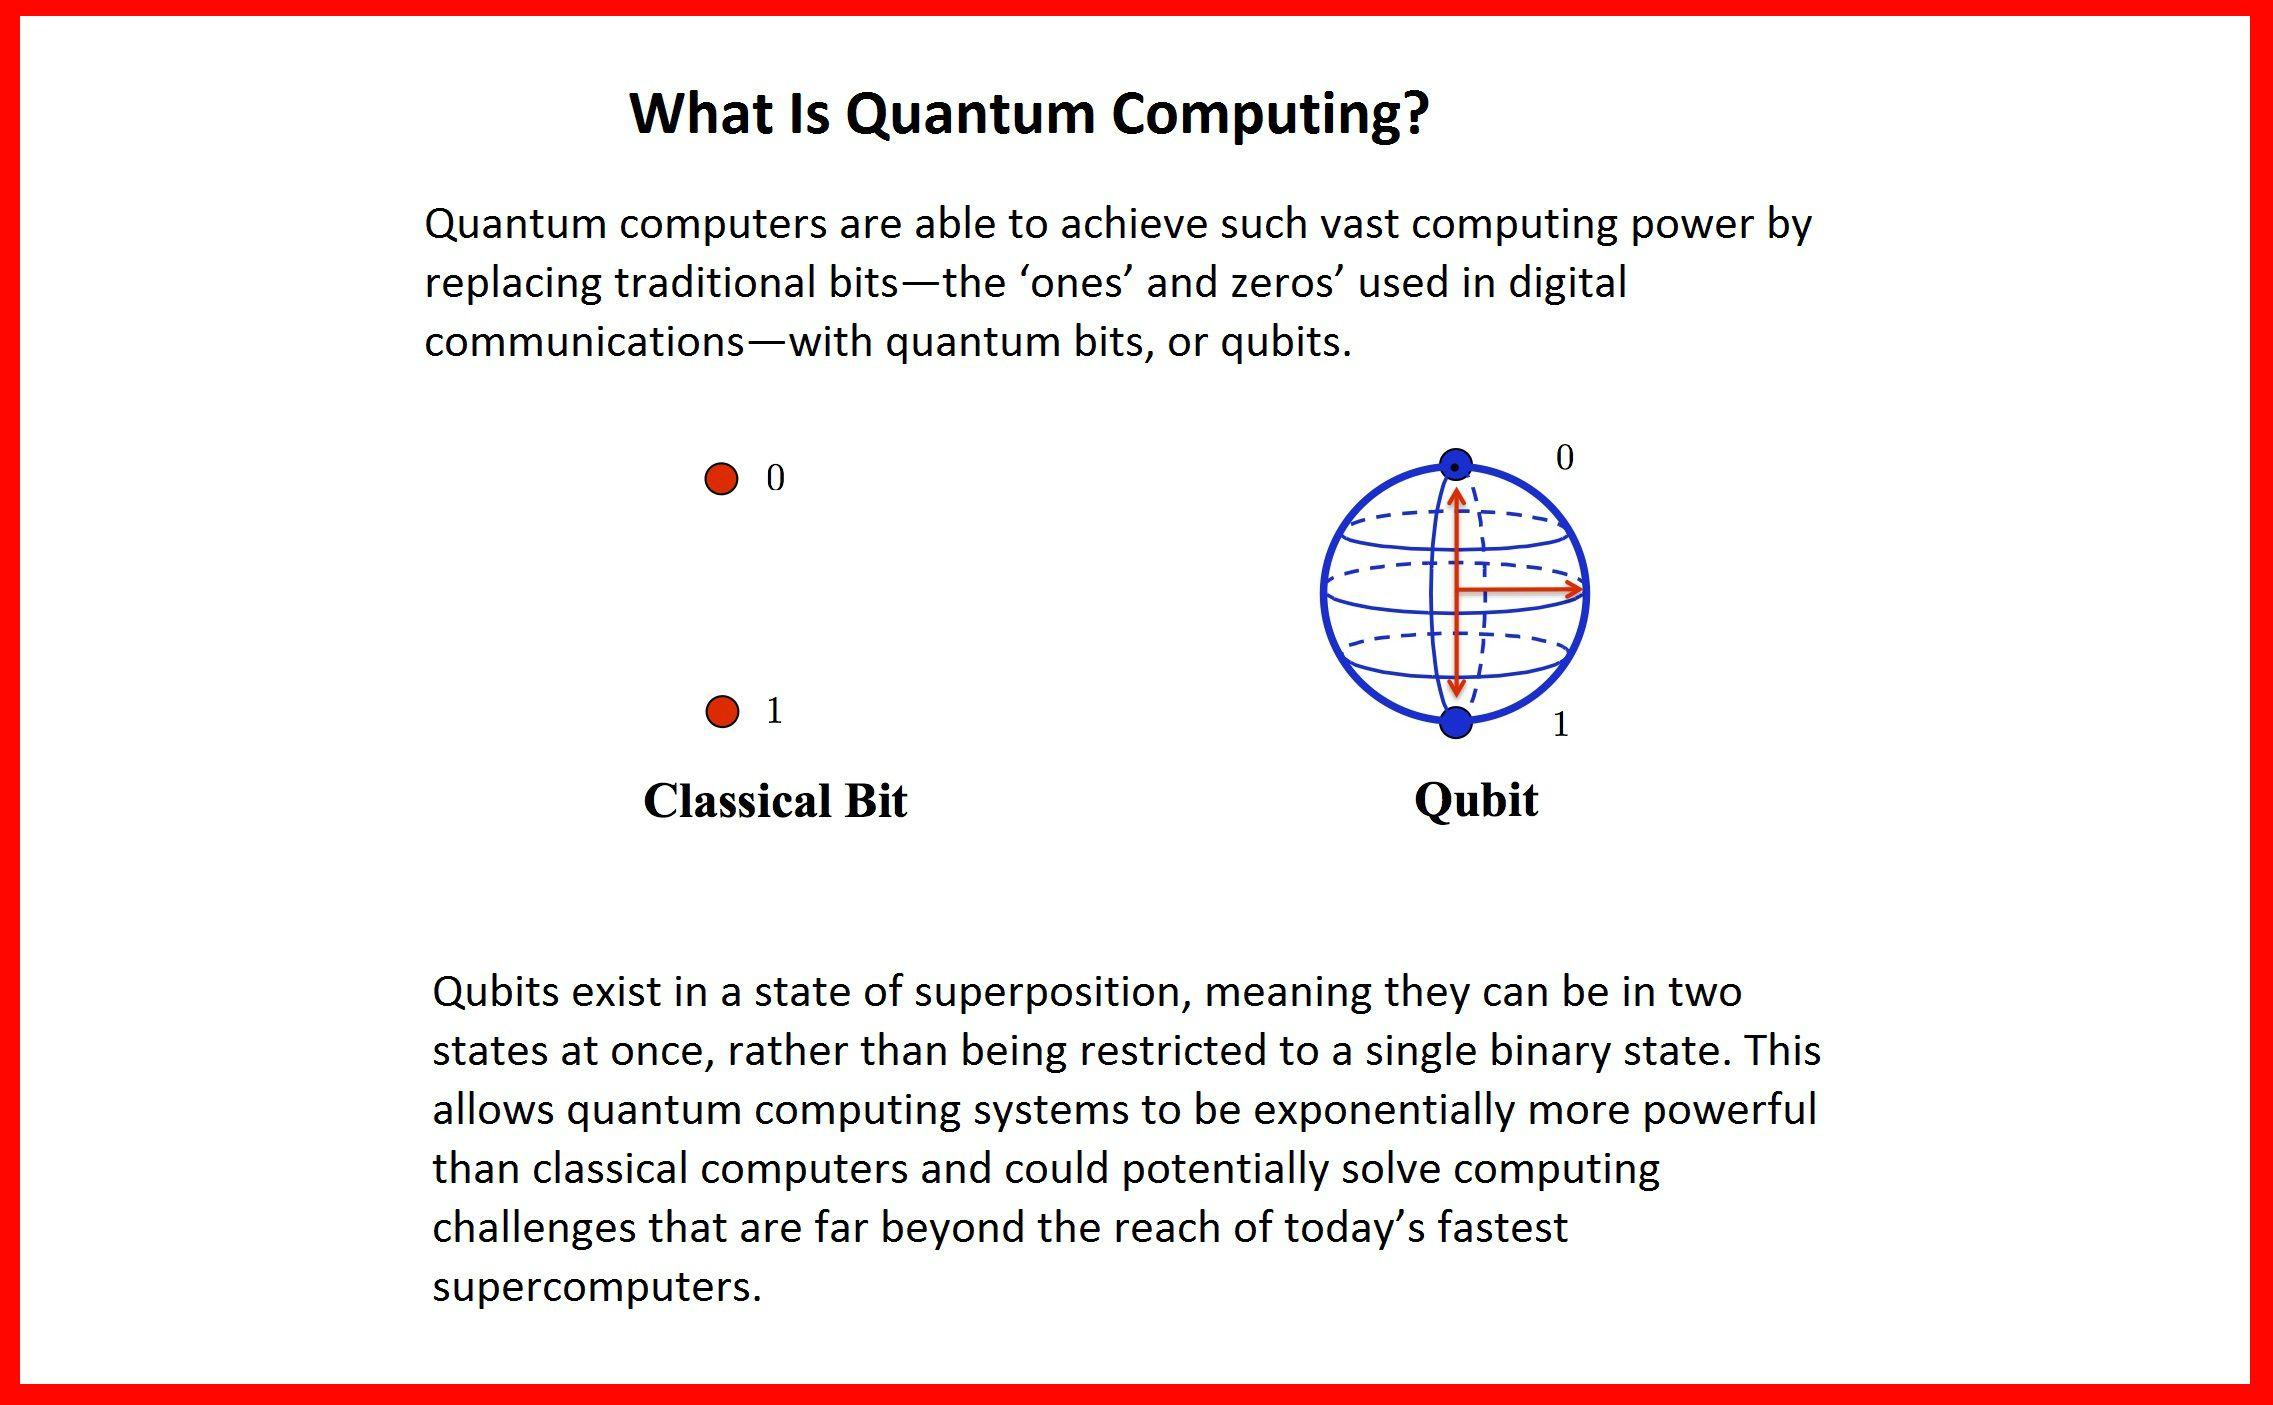 Europe's Billion Euro Bet on Quantum Computing